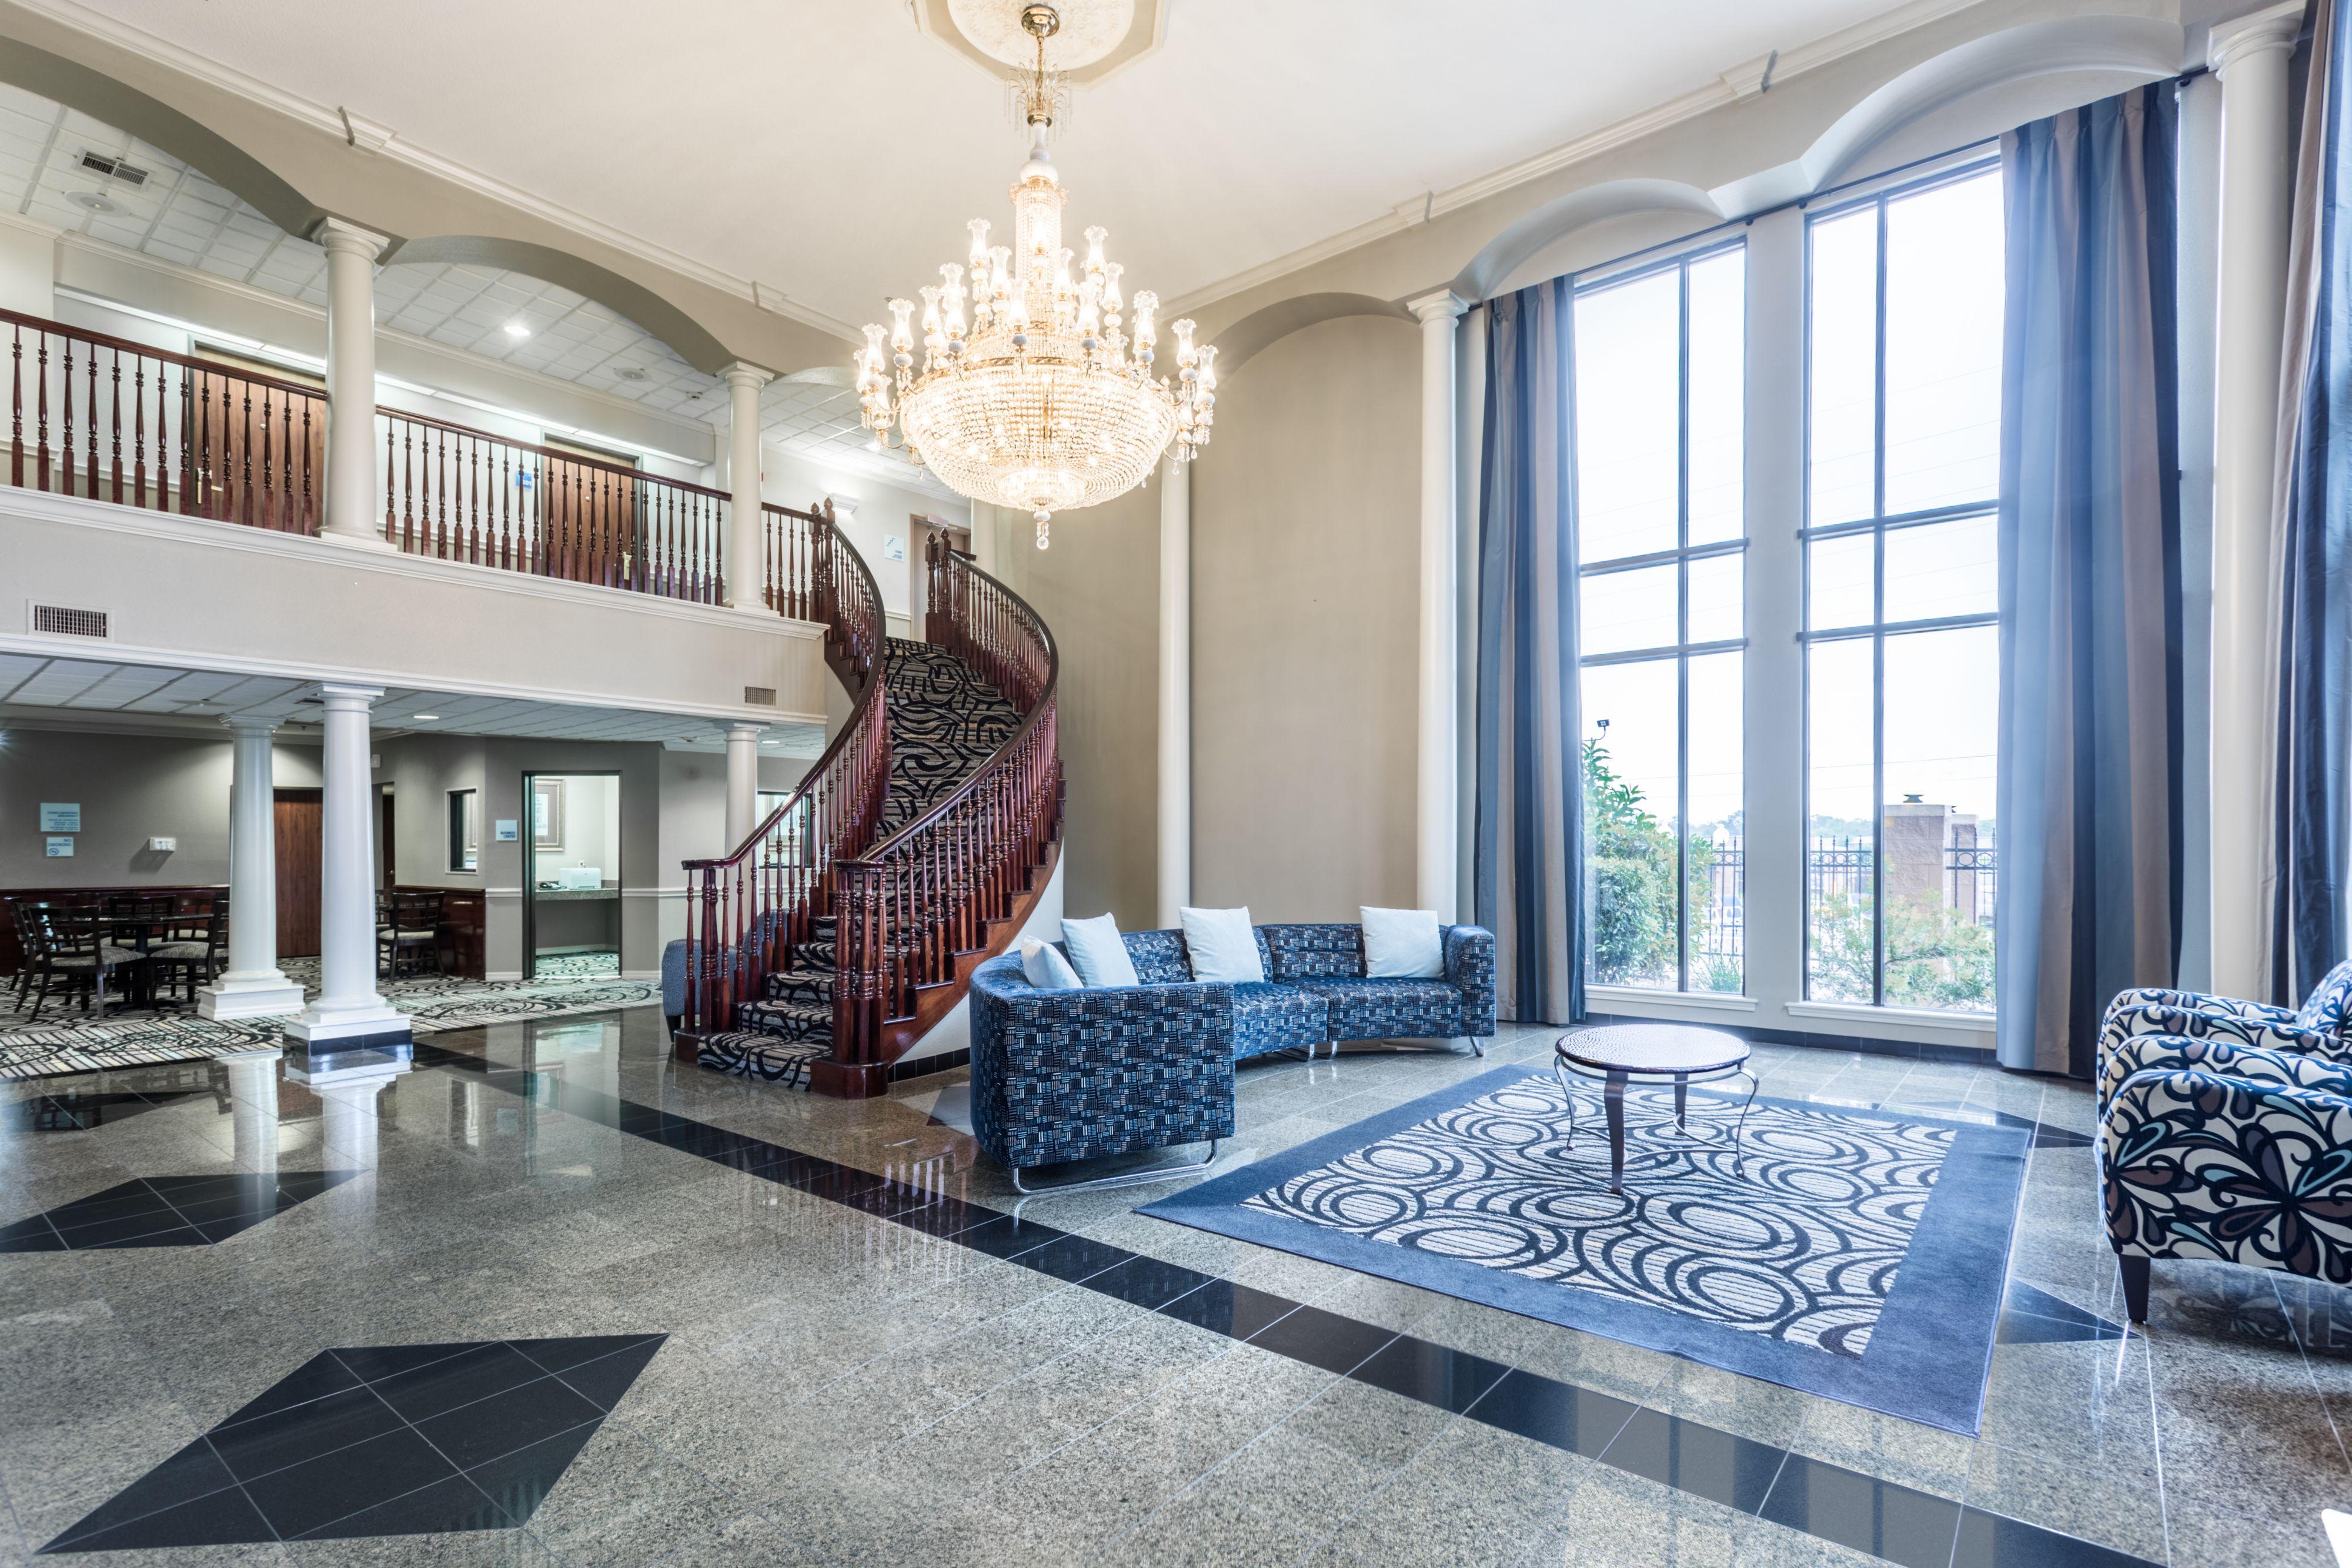 Holiday Inn Express & Suites Lake Charles image 6